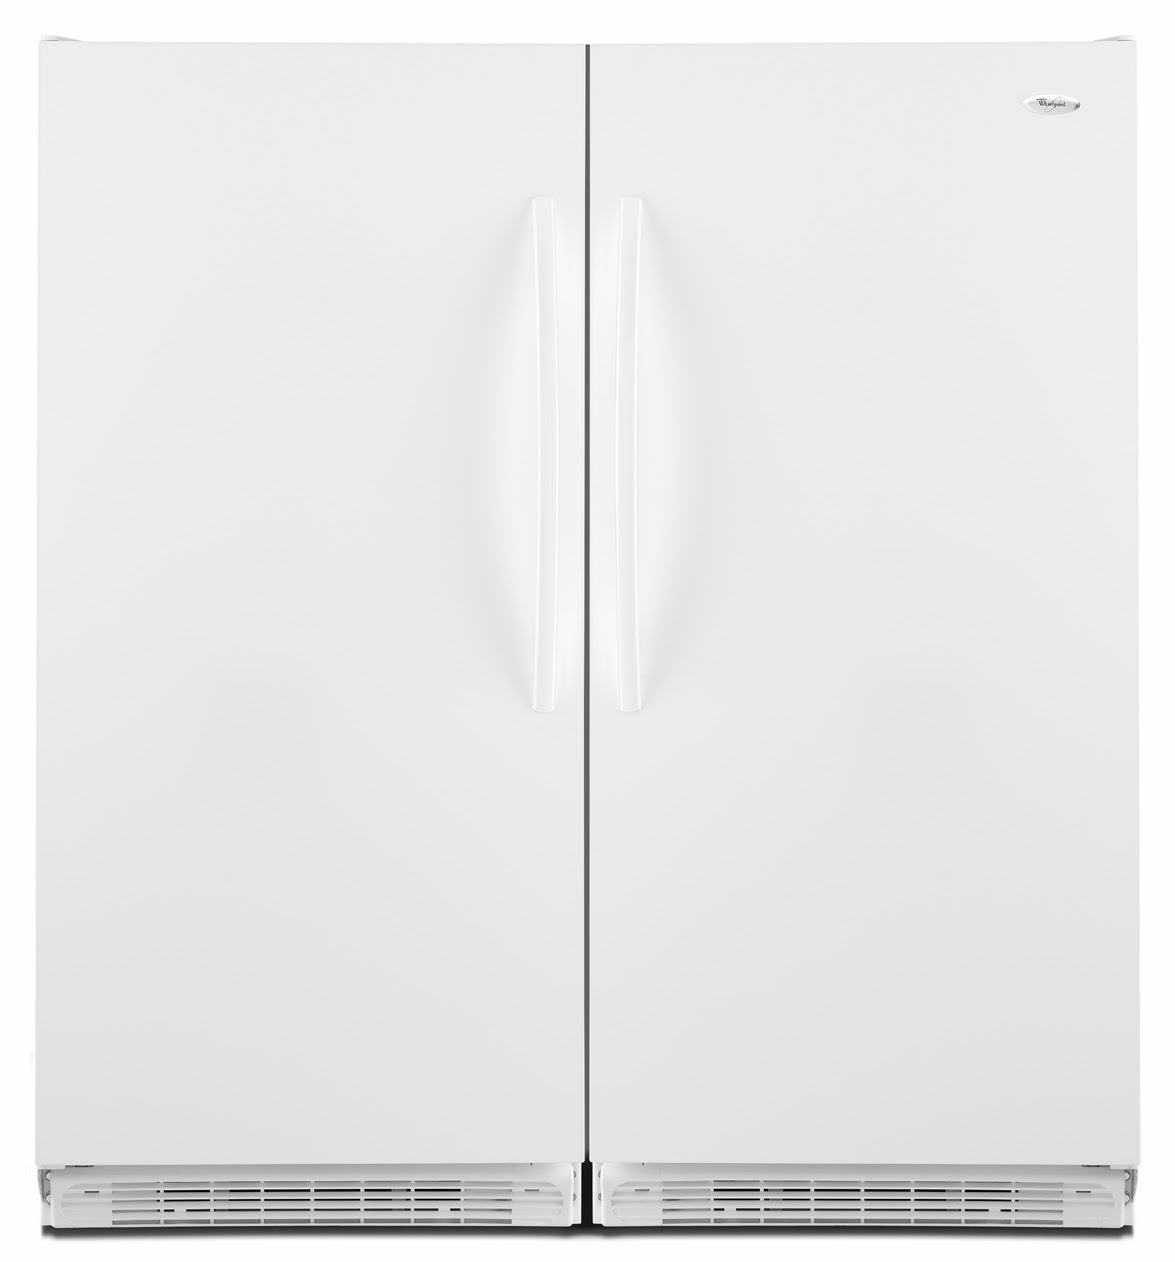 Whirlpool Refrigerator Brand Ev188nywq White Sidekicks